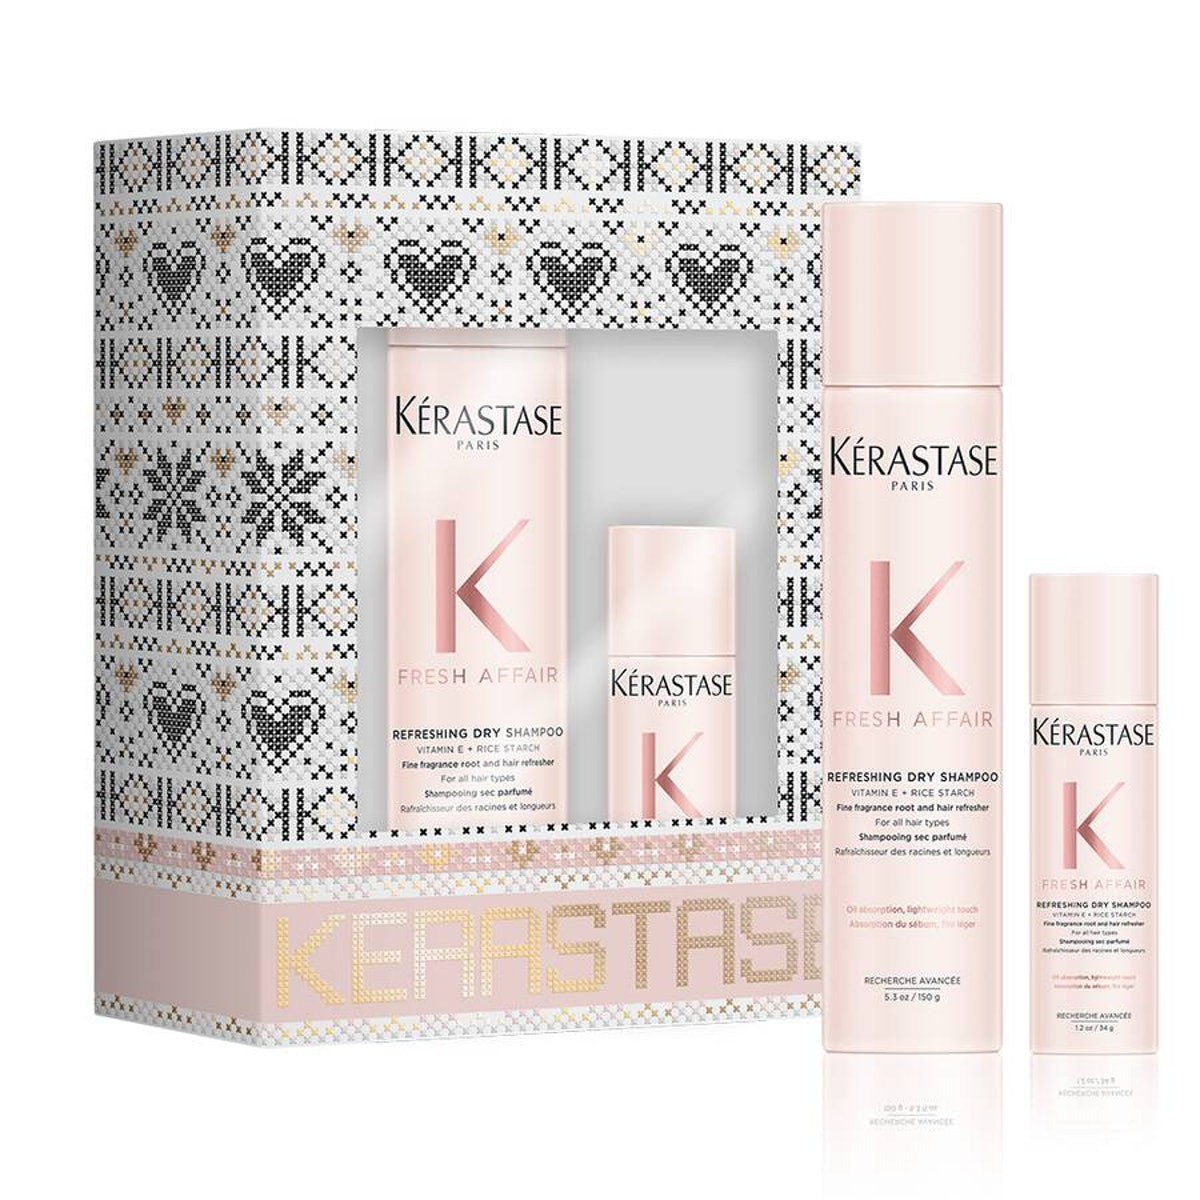 Kérastase Fresh Affair Luxury Gift Set Duo